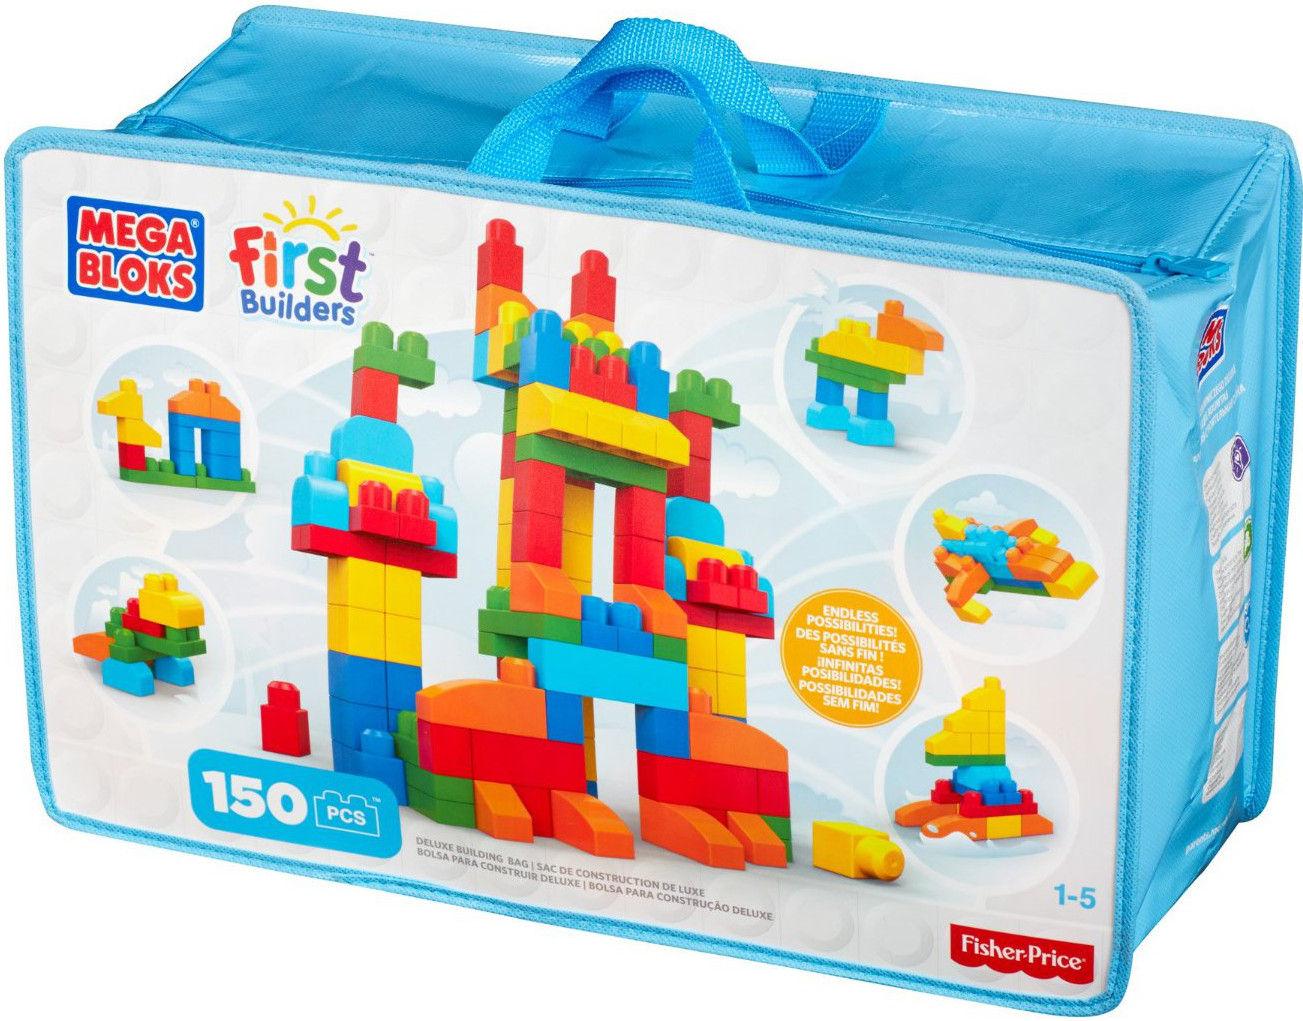 Конструкторы для малышей Mega Bloks First Builders CNM43 Делюкс mega bloks first builders конструктор веселая ферма